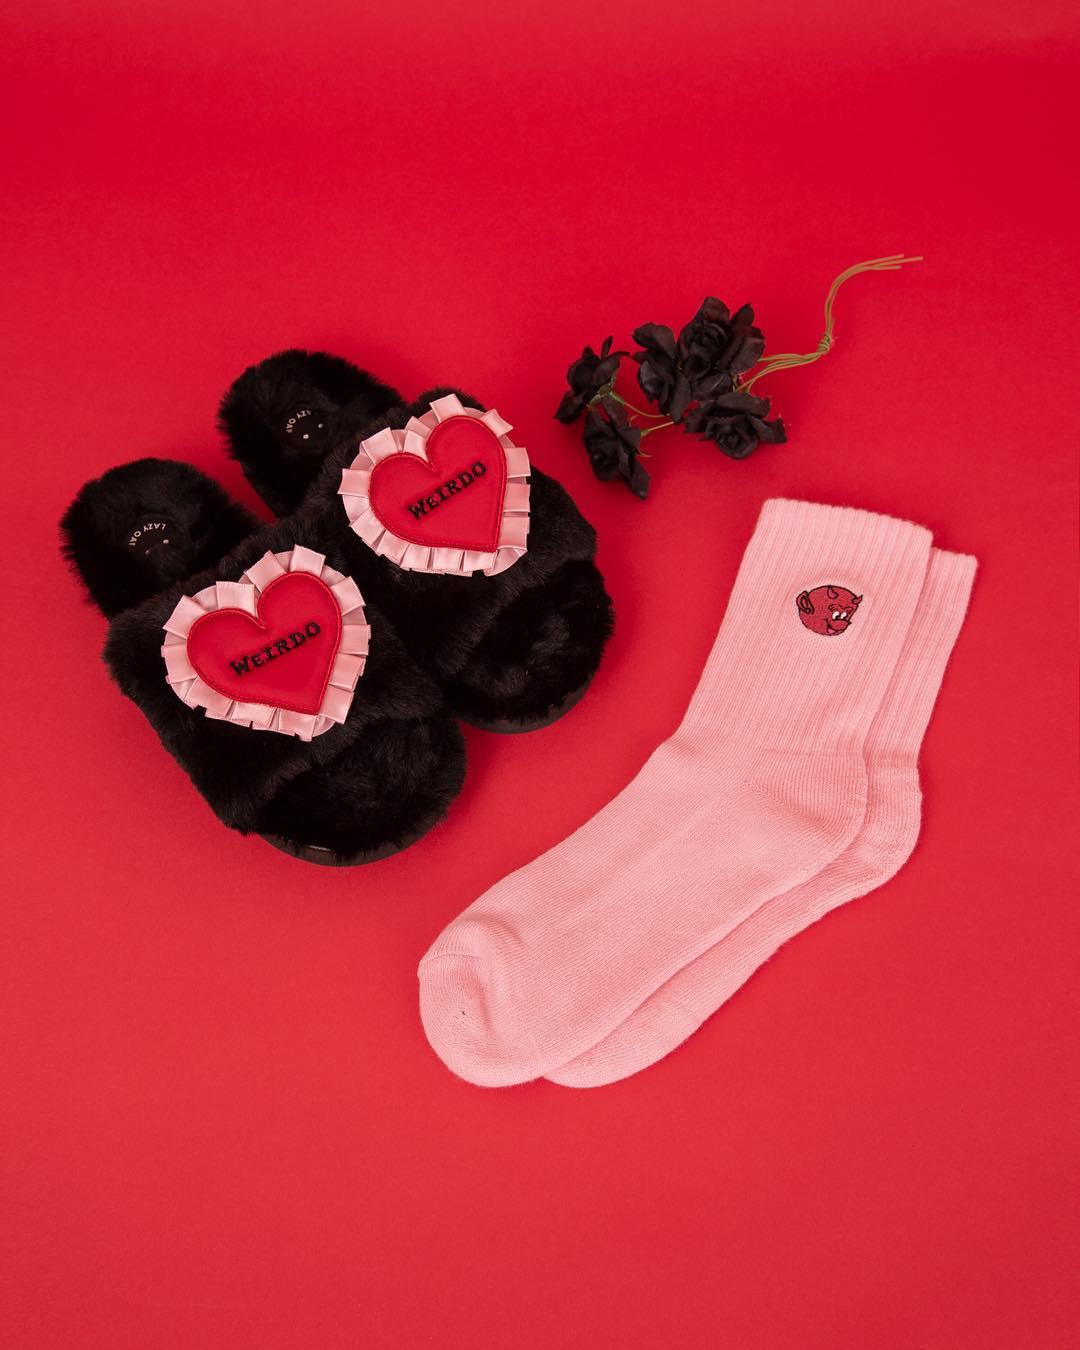 Lazy Oaf Weirdo Slippers, US$48.24 ; Lazy Oaf Little Devil Socks, US$8.58